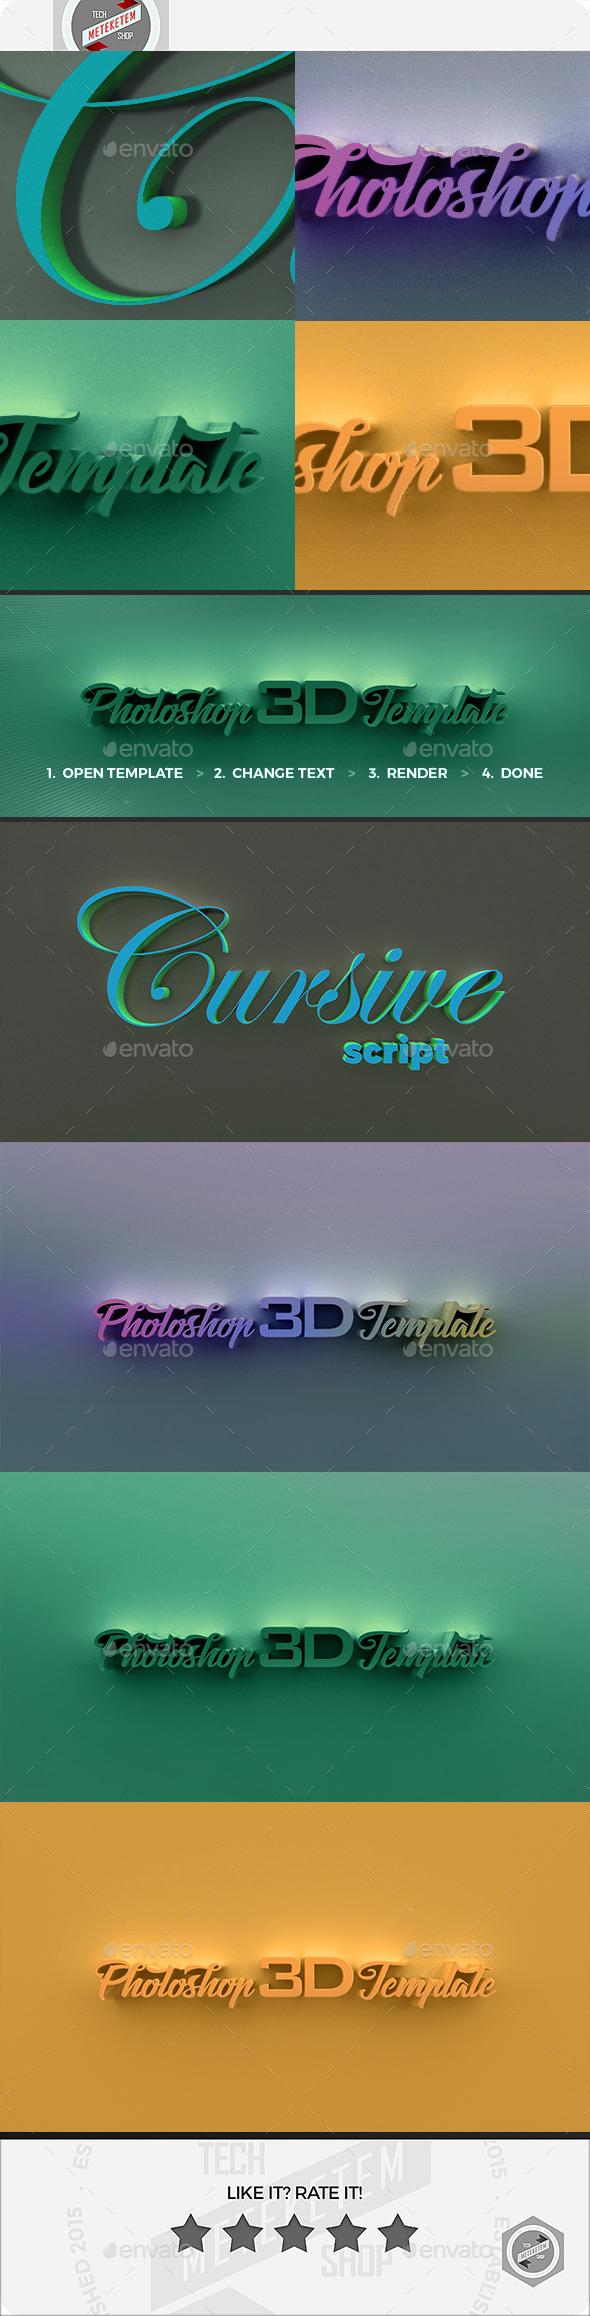 3D Photoshop Template 2 - Text 3D Renders